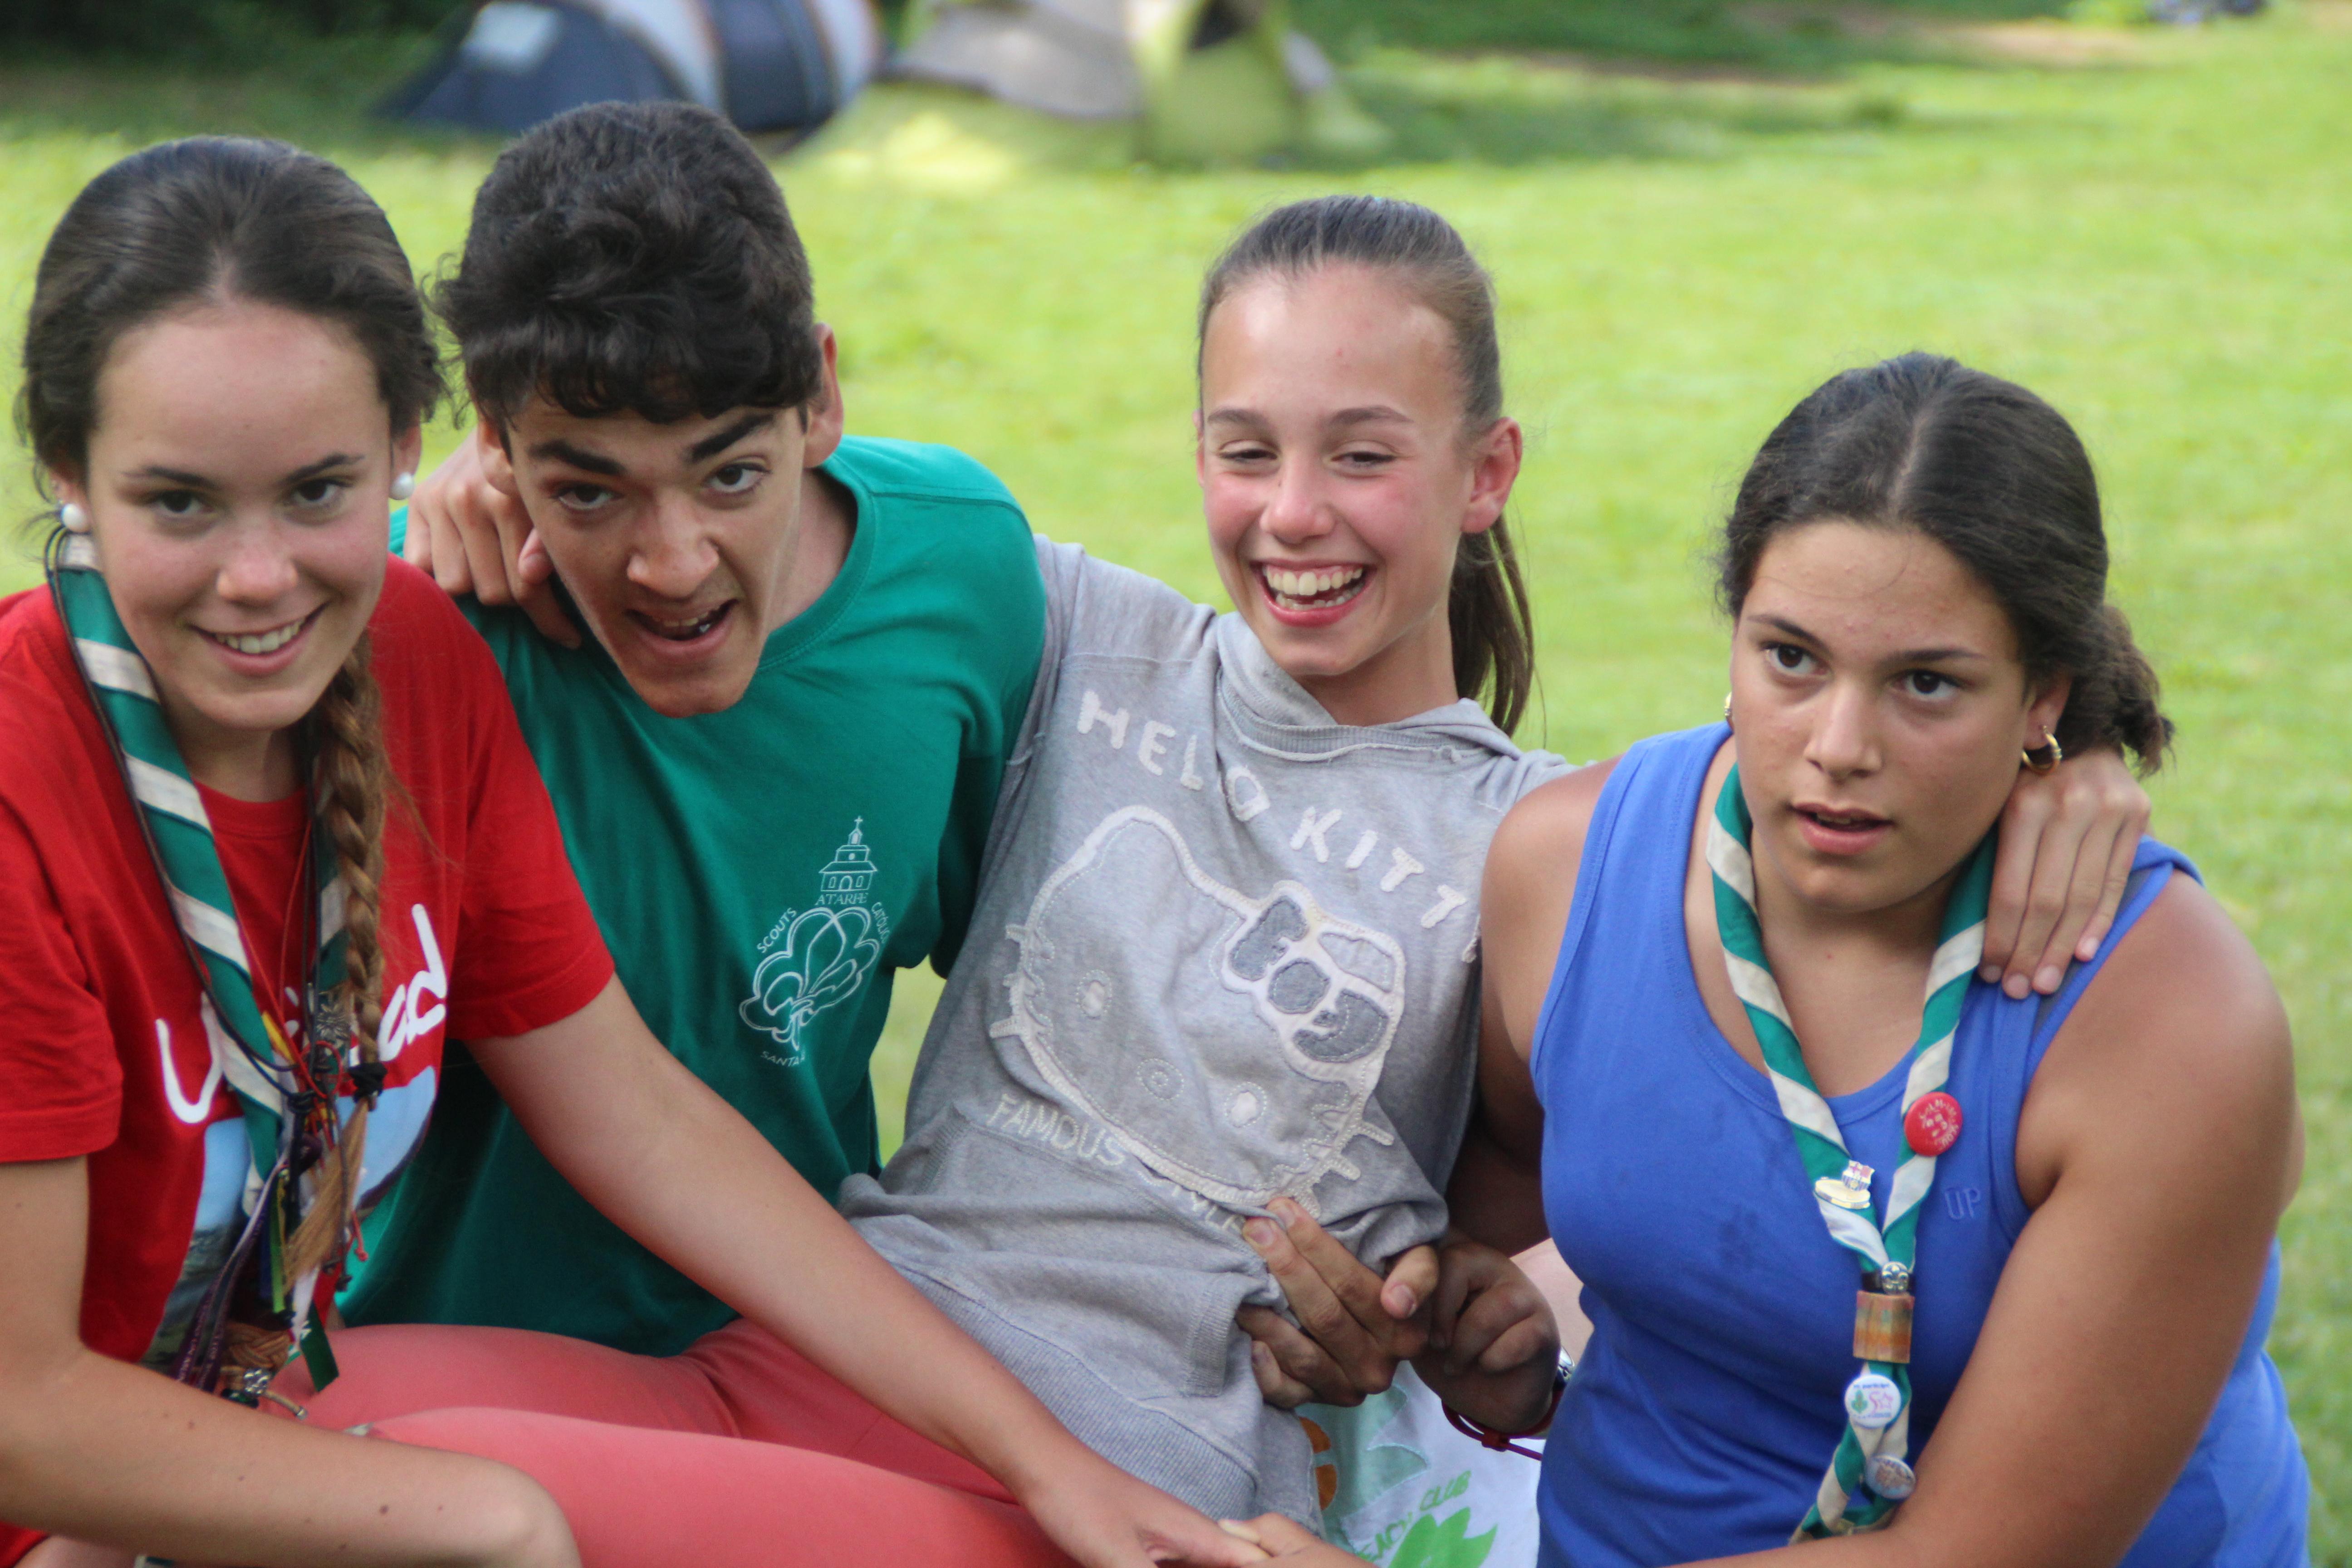 15-16 - Grupo - Campamento de verano - P214